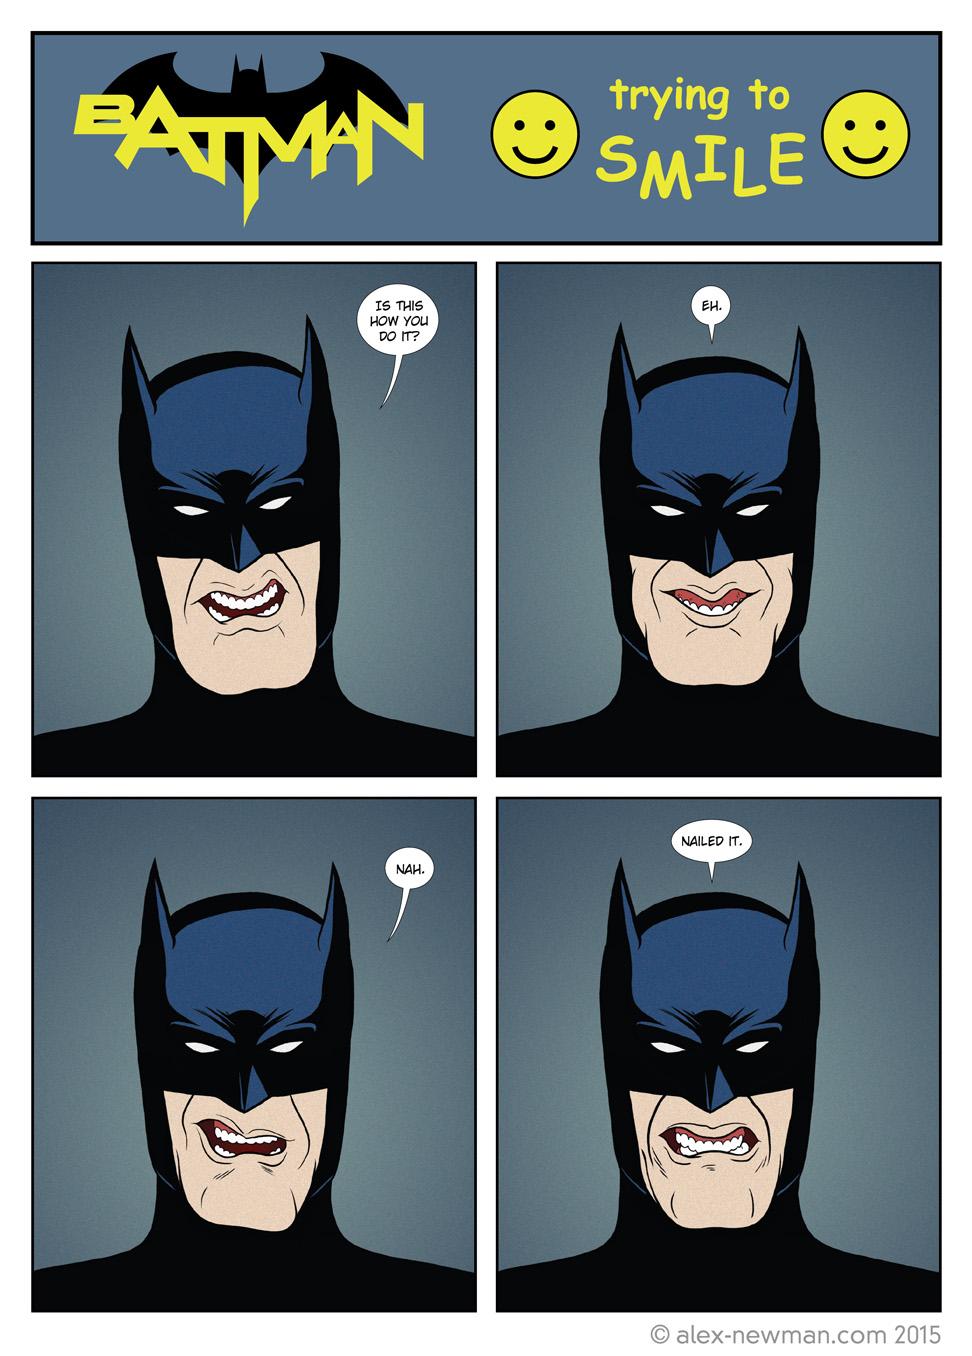 Batman Tries to Smile_WEB.jpg